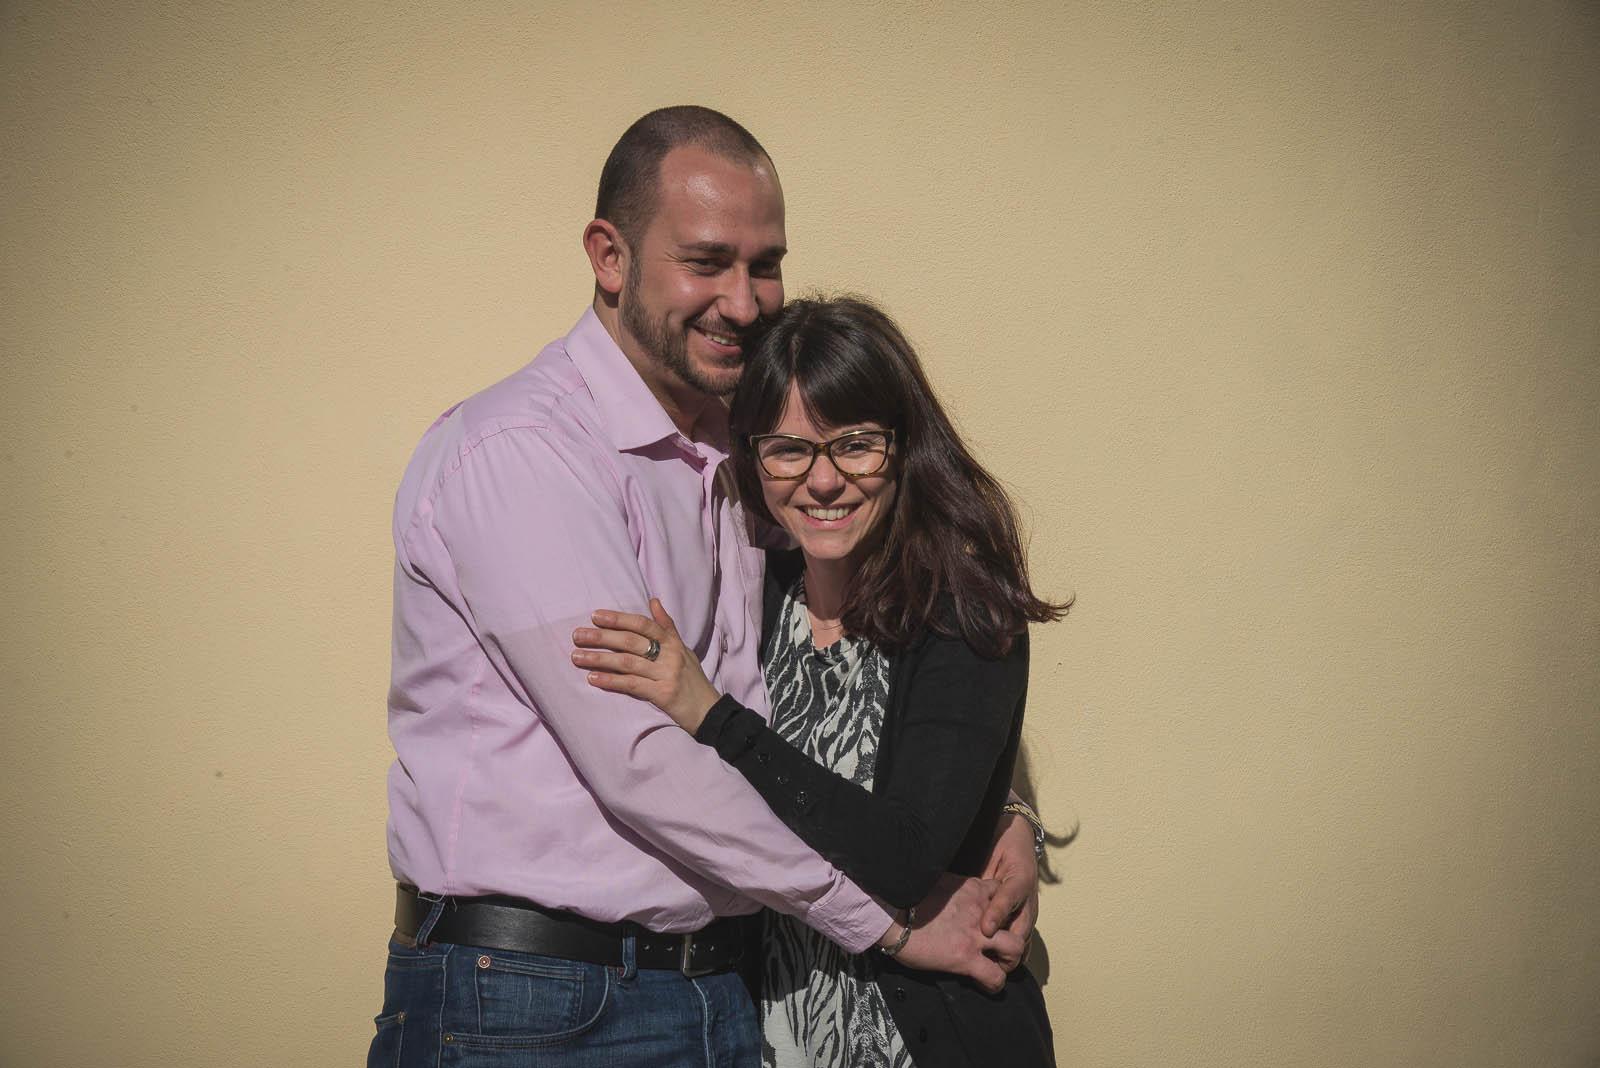 servizio fotografico prematrimoniale, Elisa e Thierry